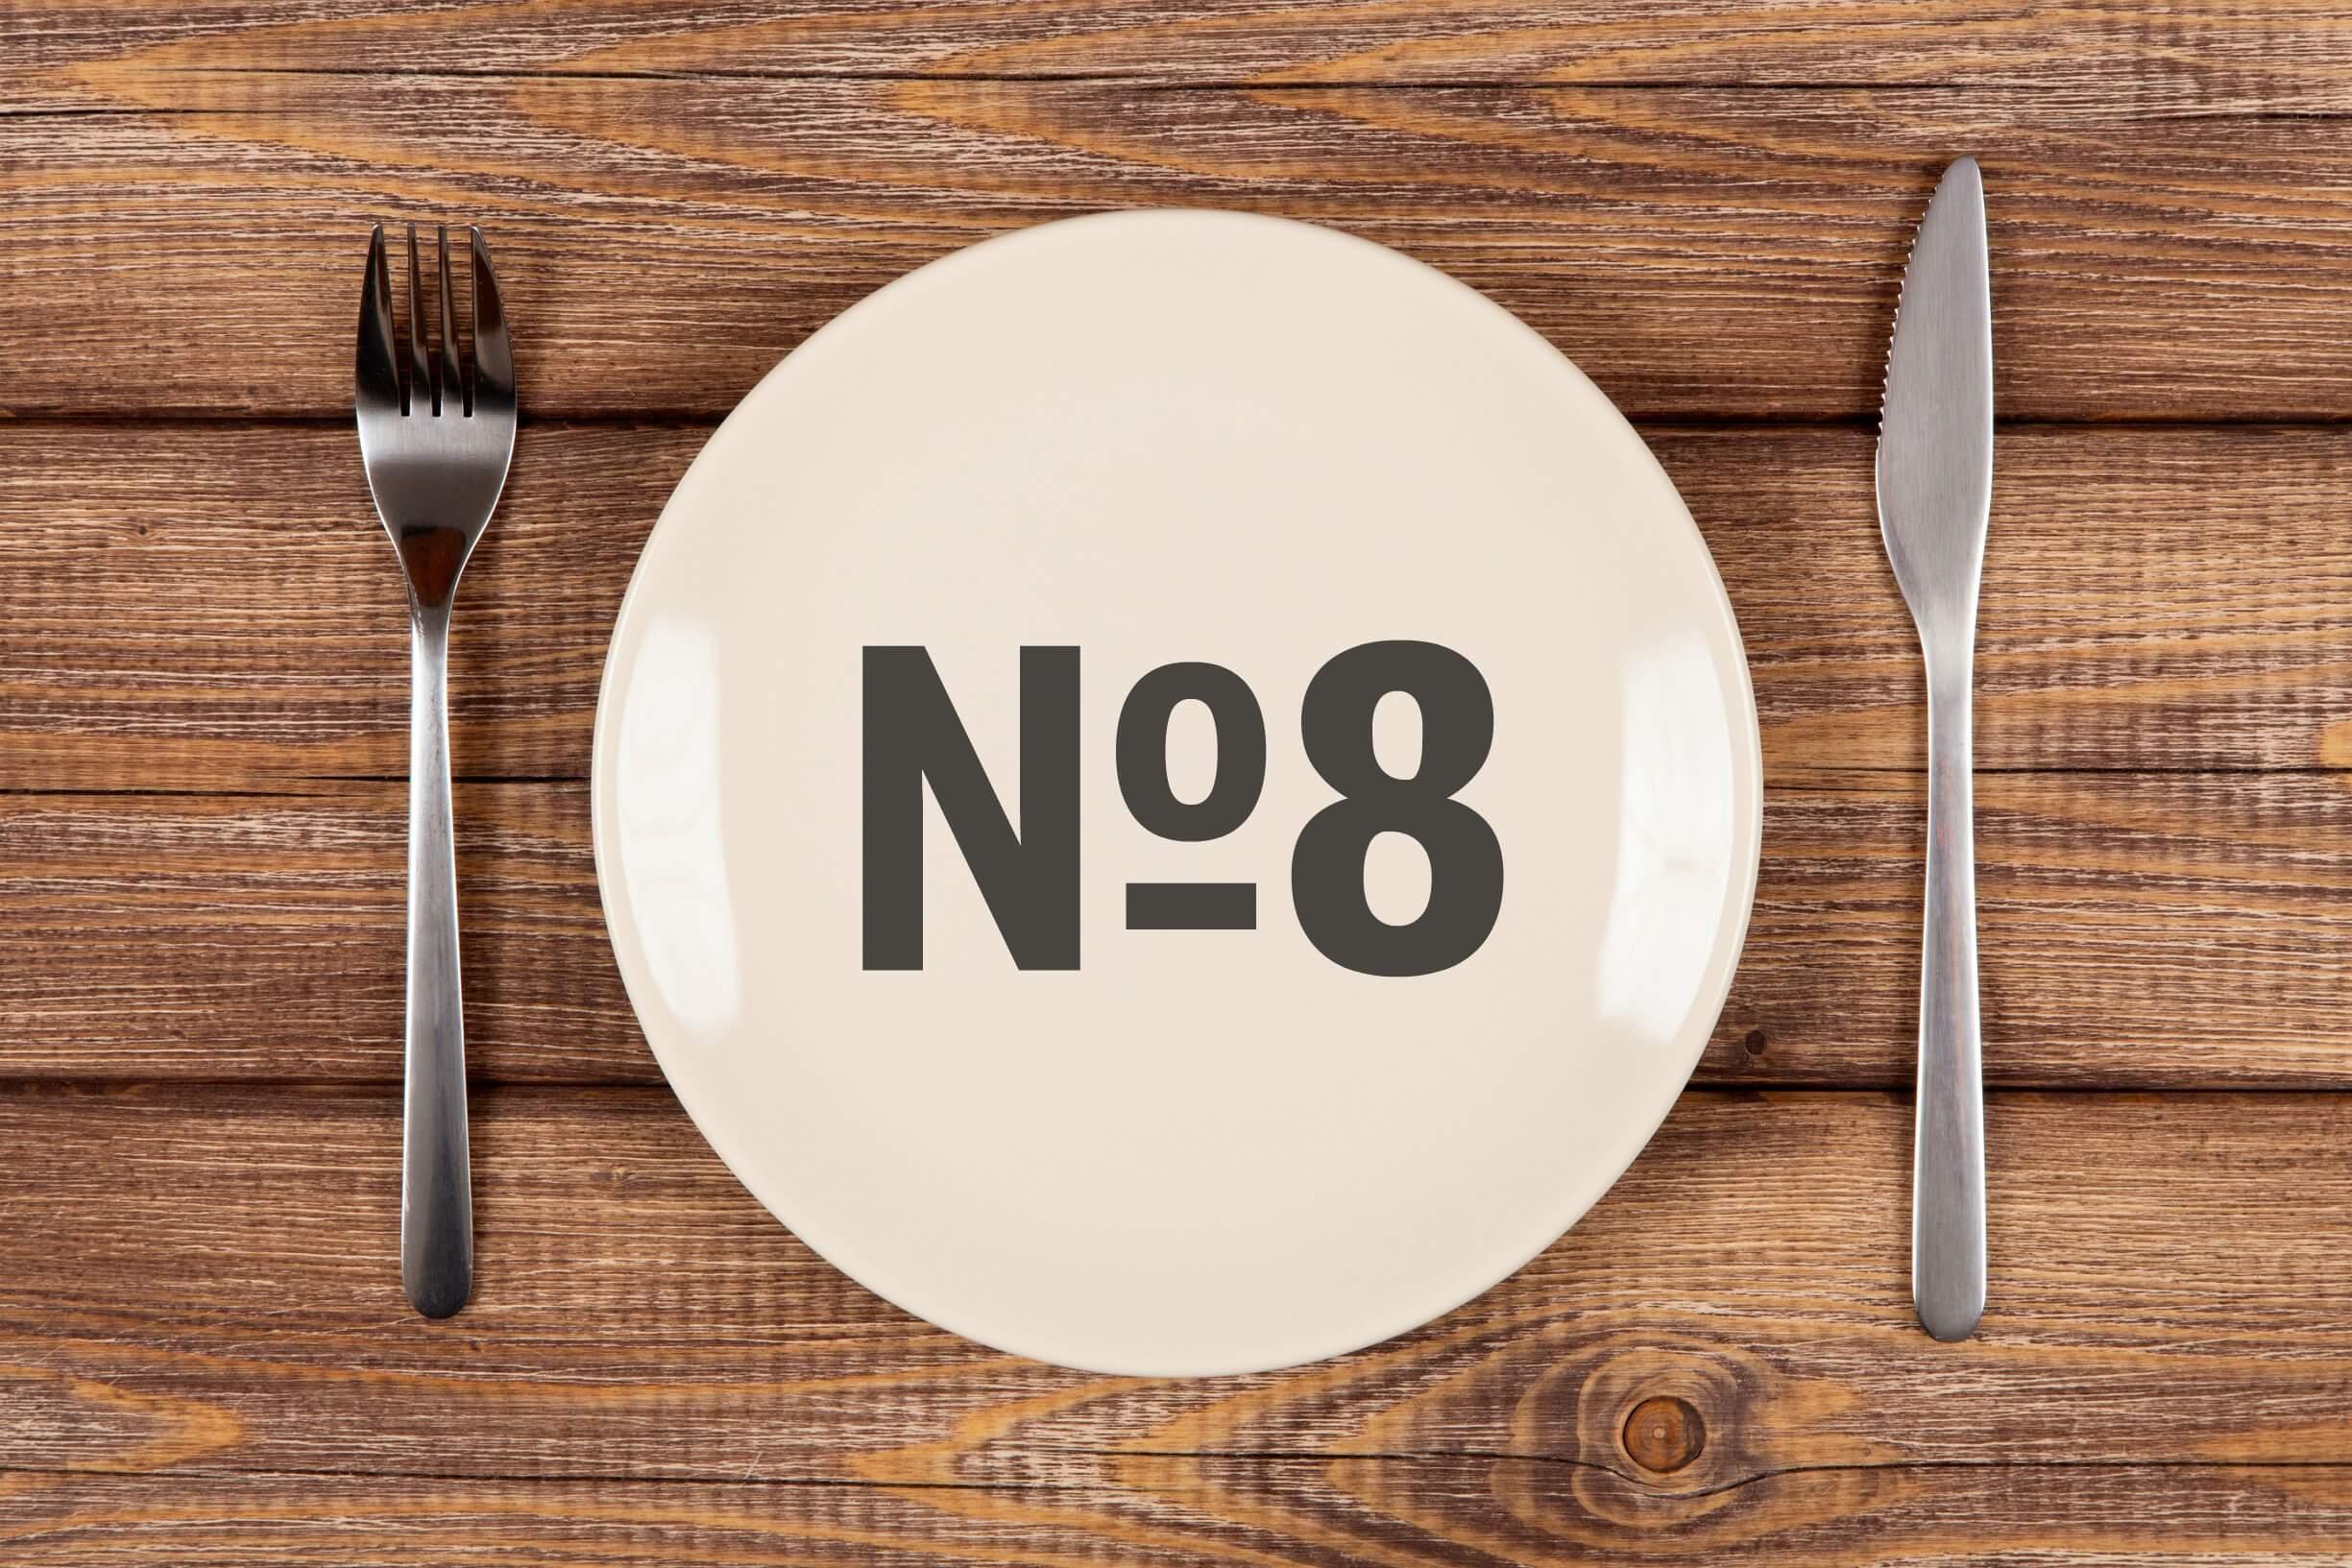 Диета стол №8 при ожирении: правила и меню на неделю